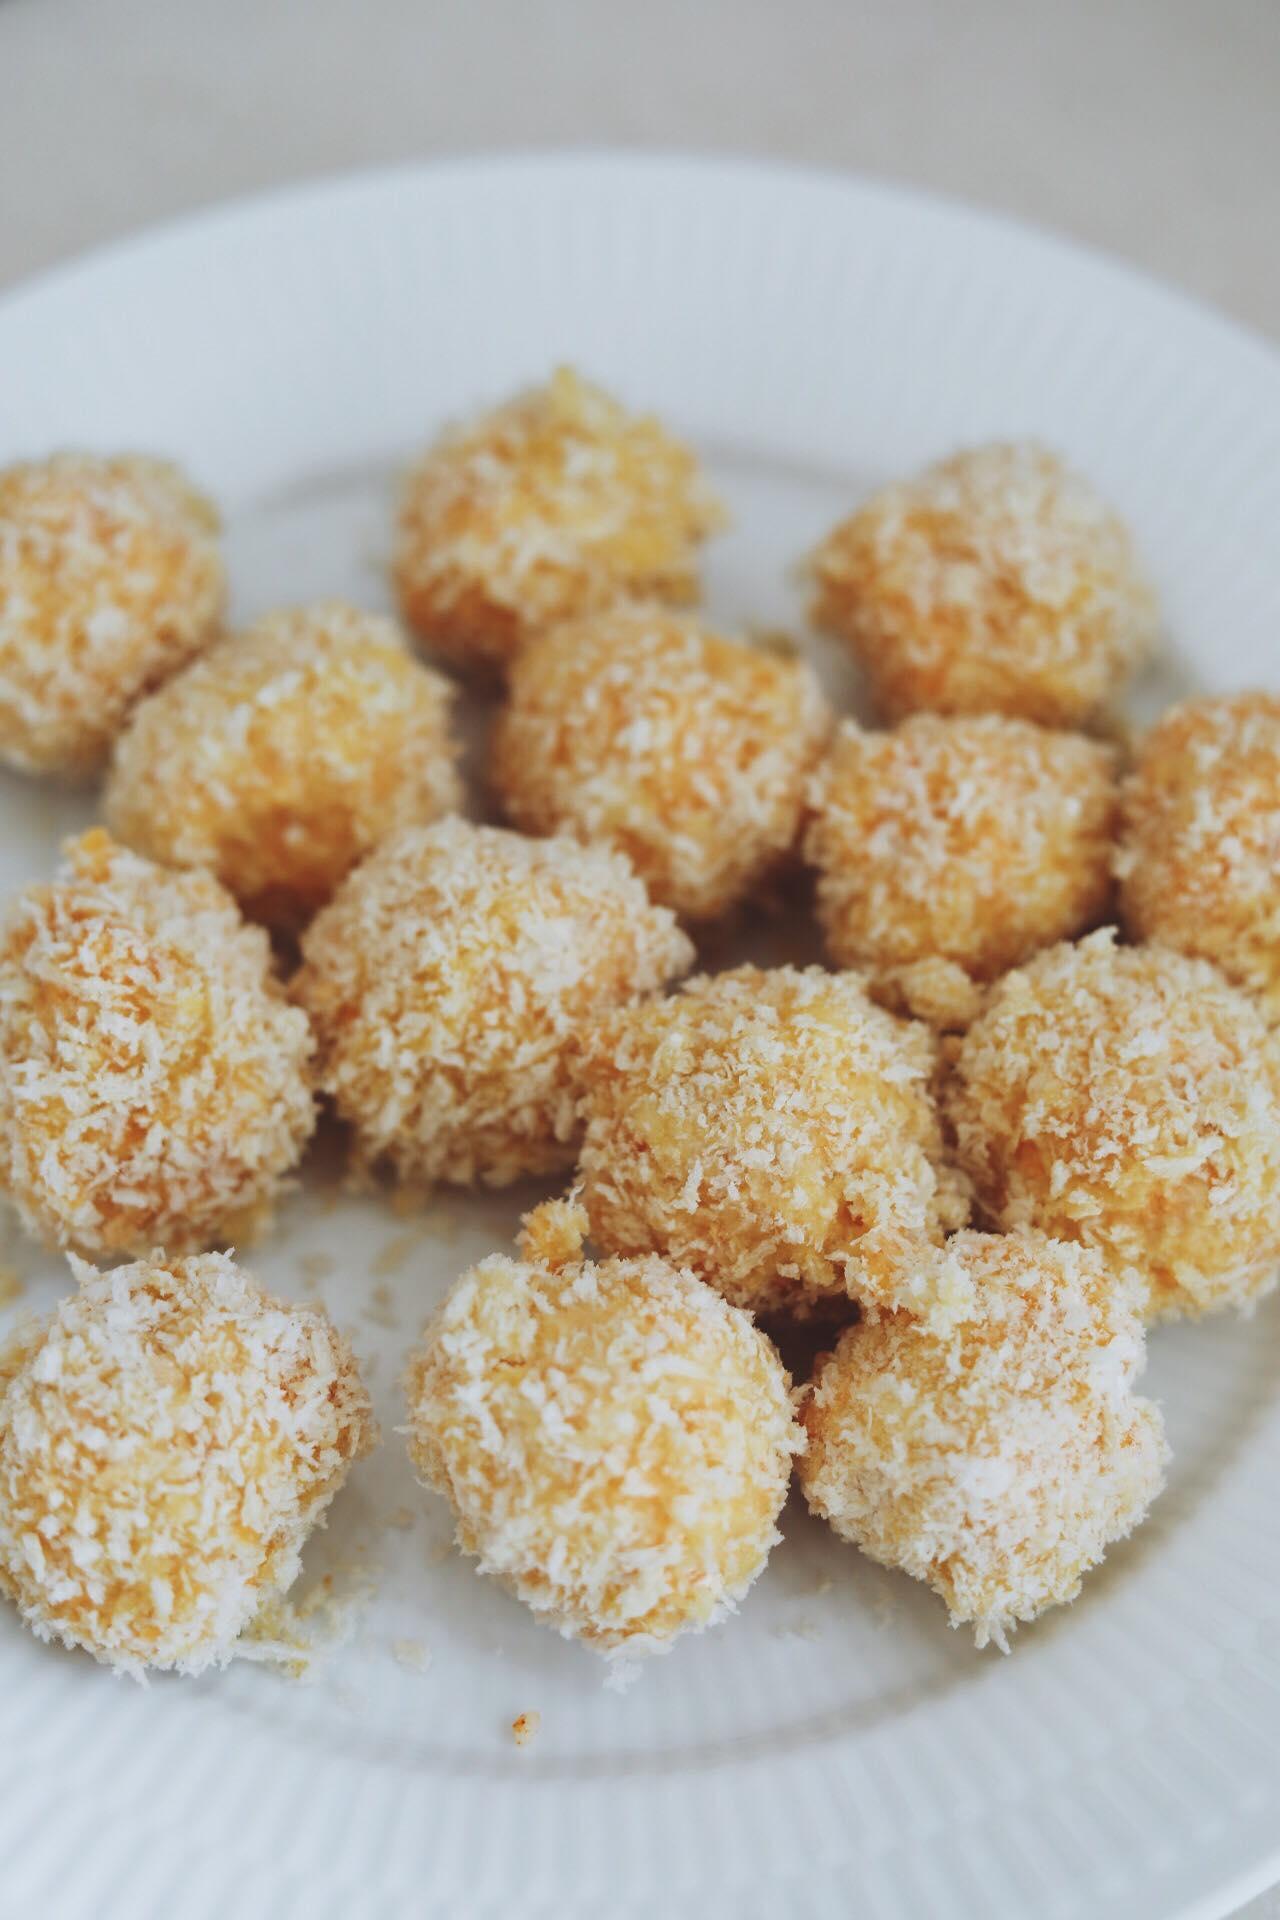 Fredagshygge- Chili cheese tops